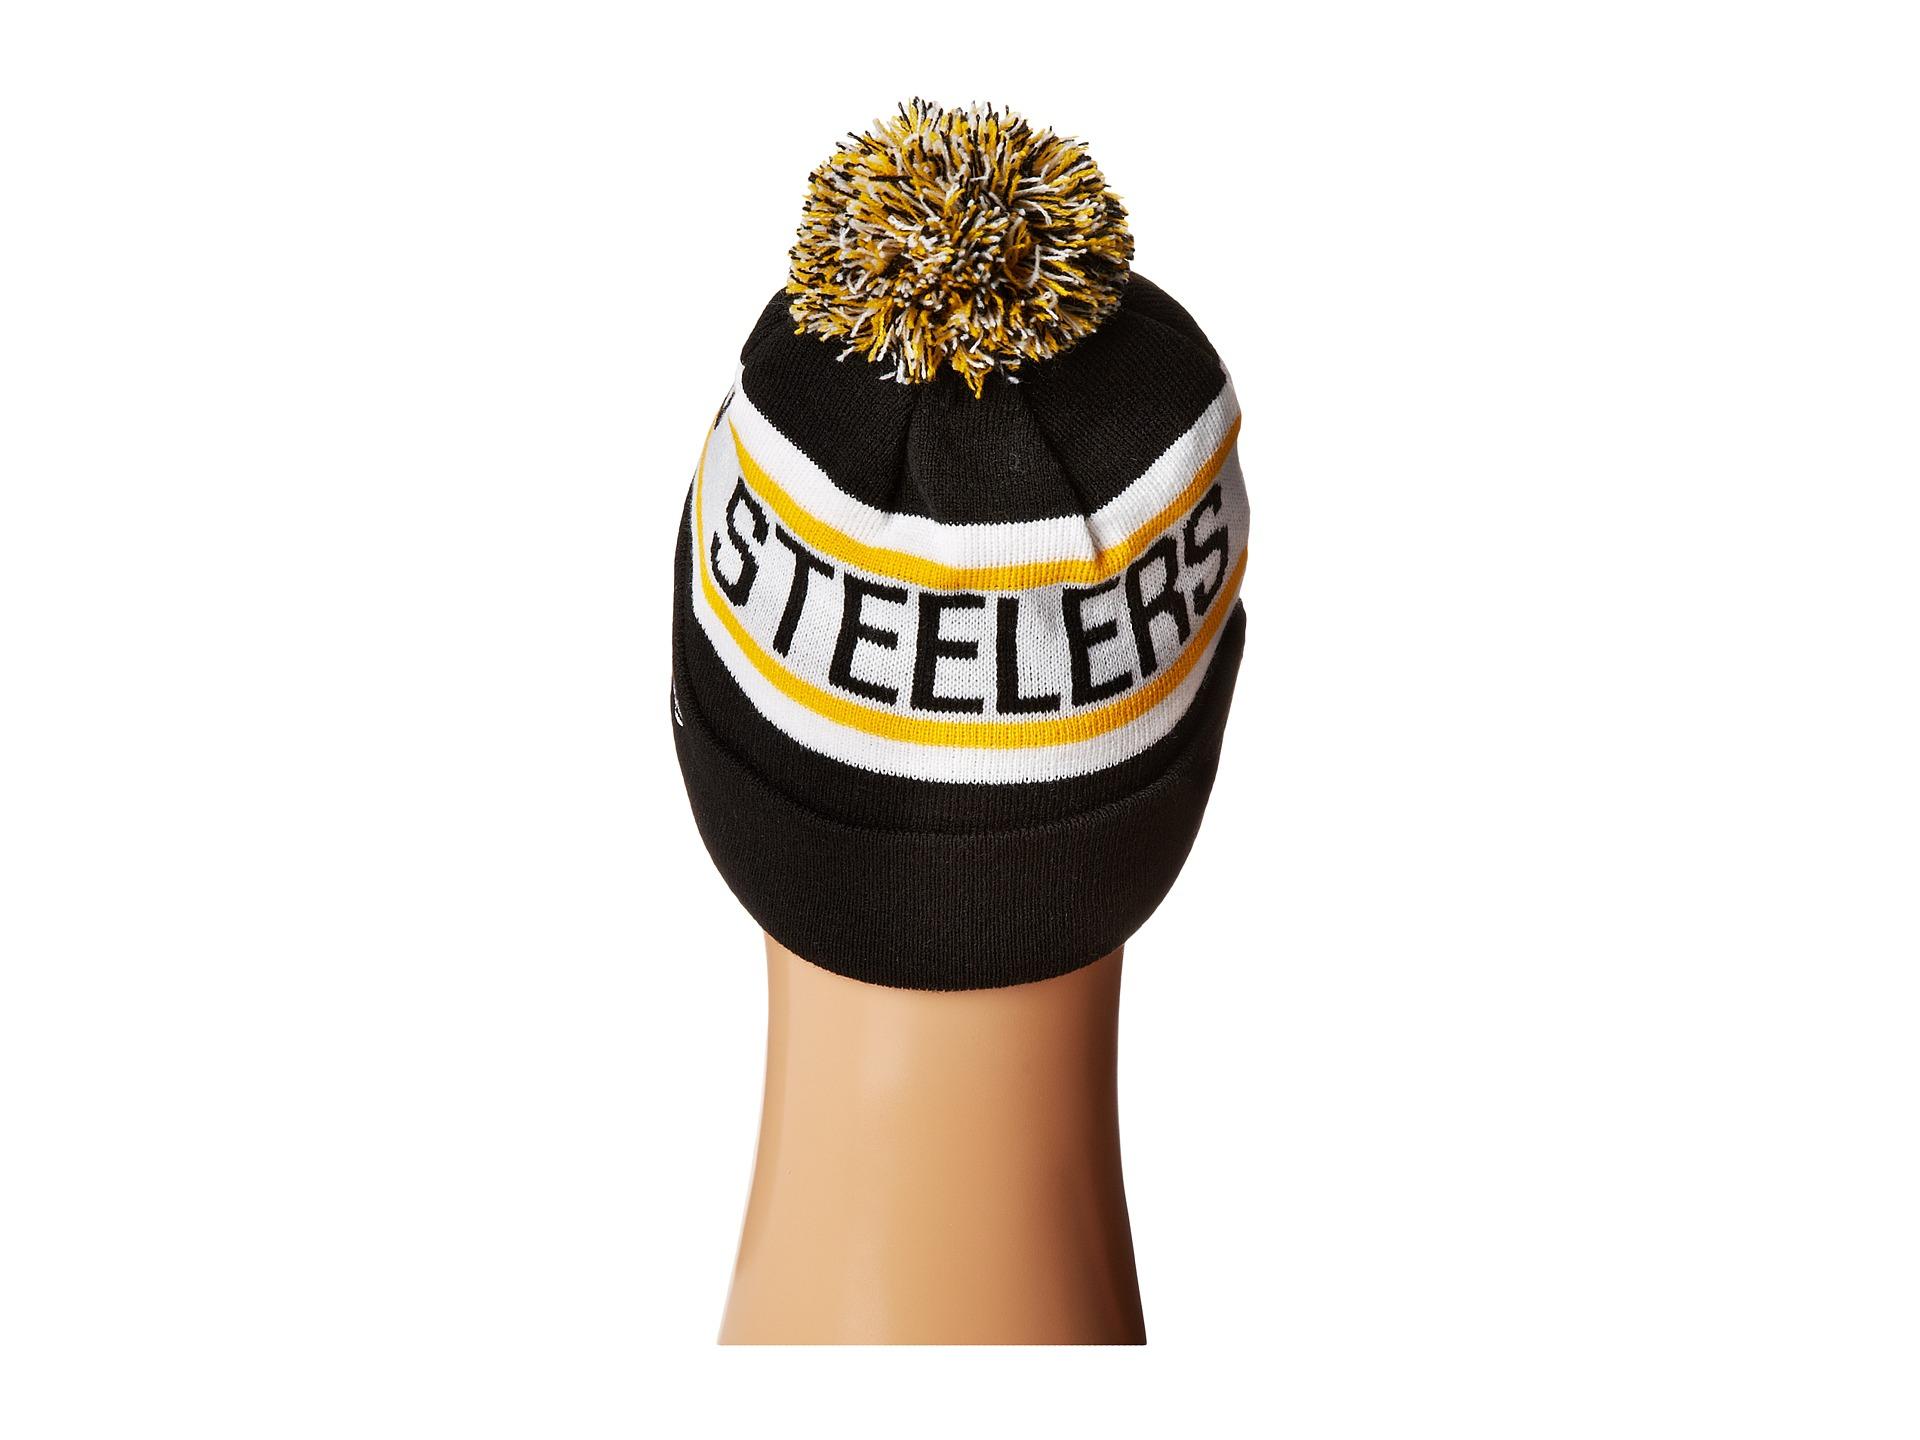 909618f0b Lyst - KTZ Biggest Fan Redux - Pittsburgh Steelers in Black